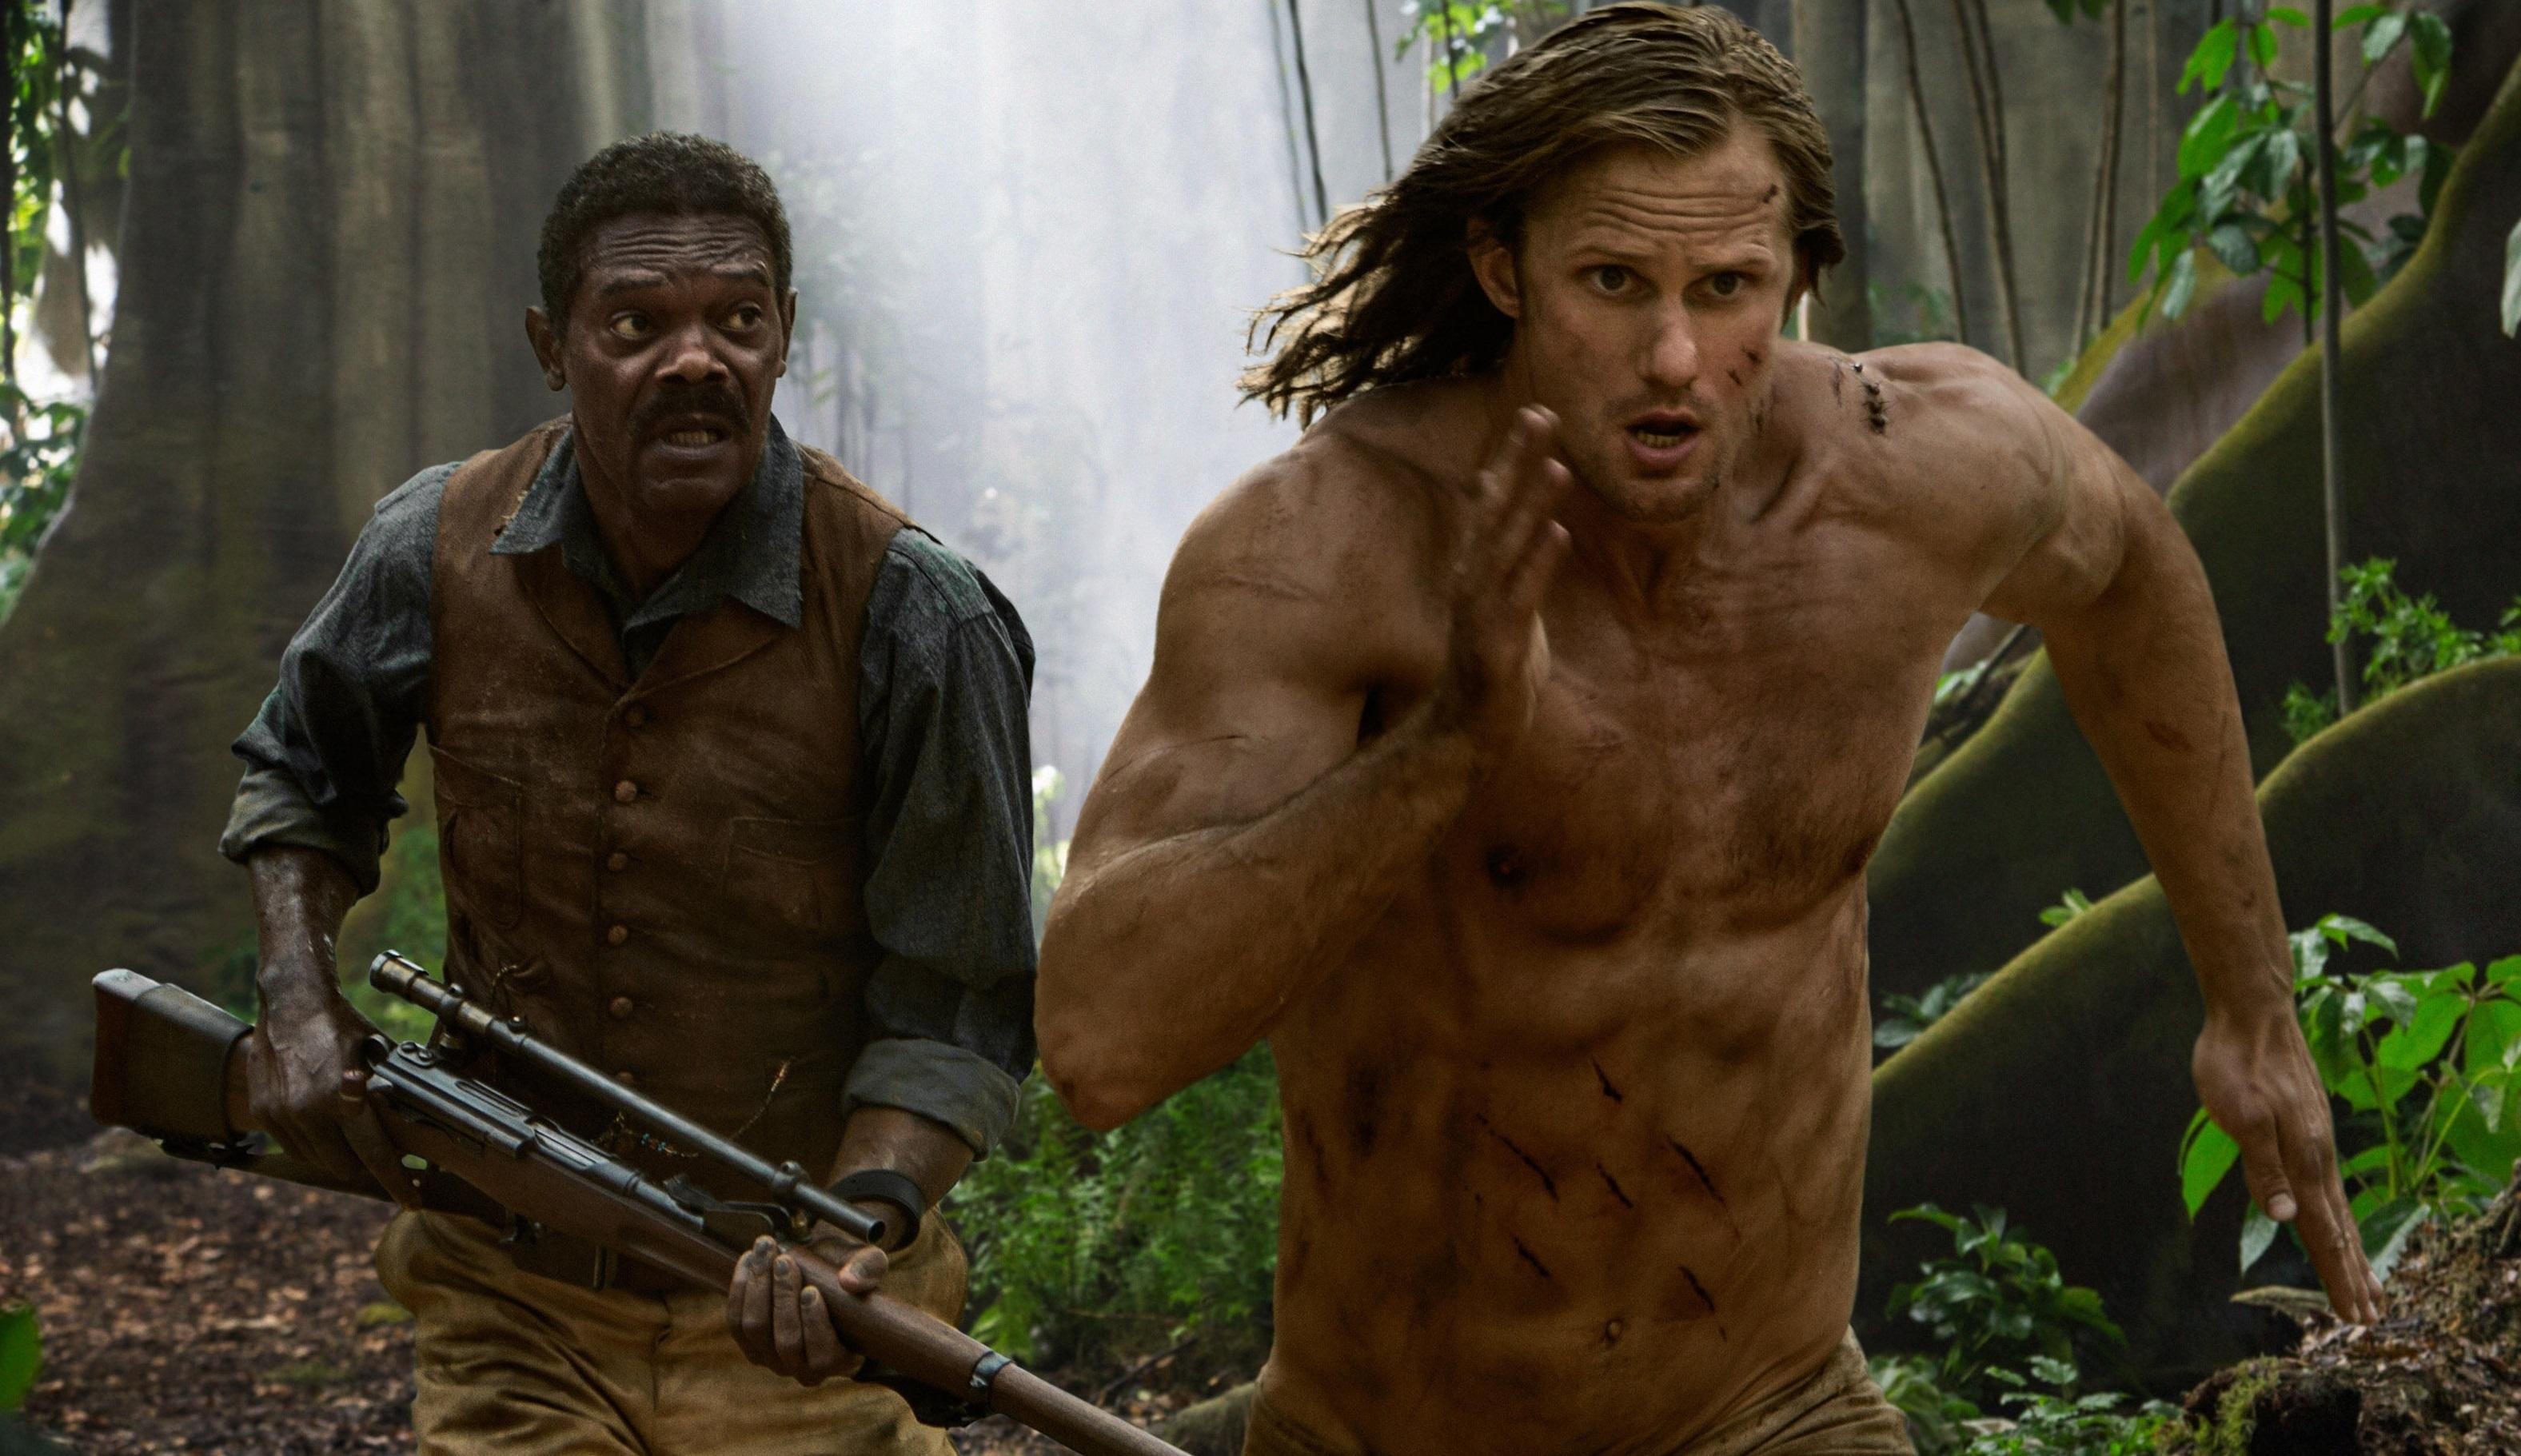 Samuel L Jackson and Alexander Skarsgard in the new Tarzan film (PA)